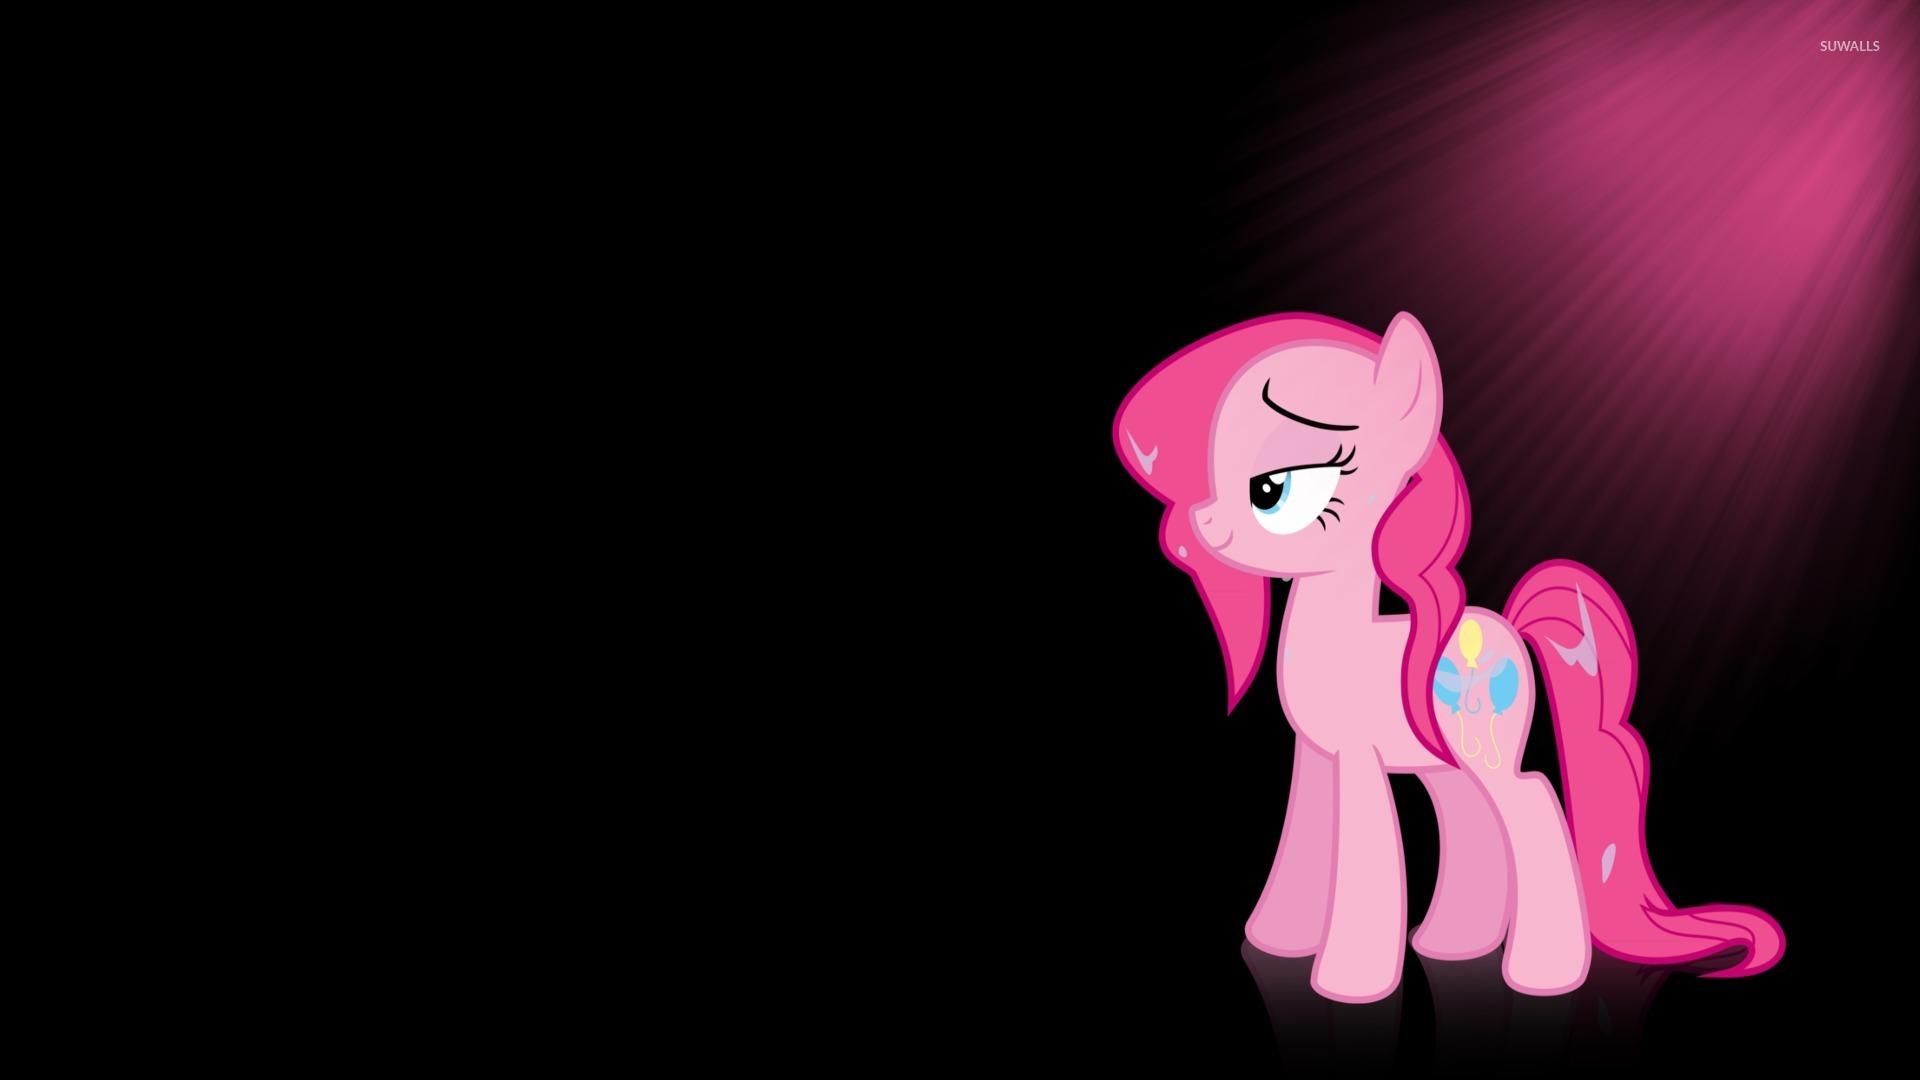 Sun Light Upon Pinkie Pie My Little Pony Wallpaper Cartoon